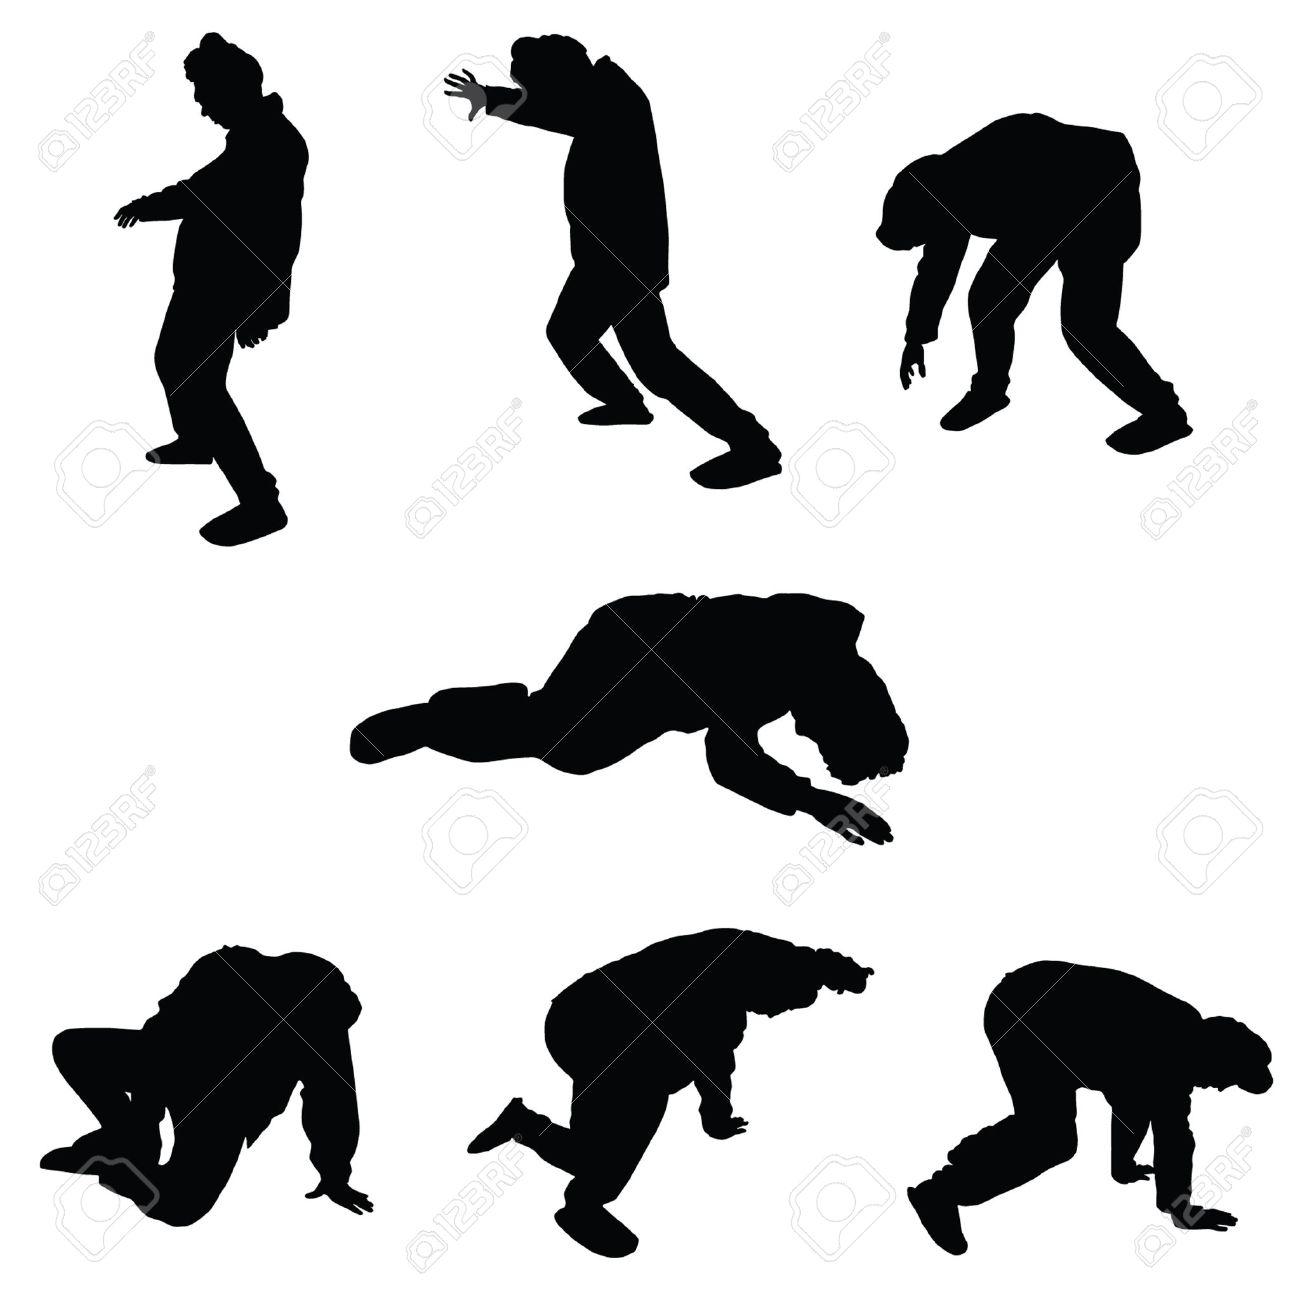 drunk man vector silhouette illustration - 33873892